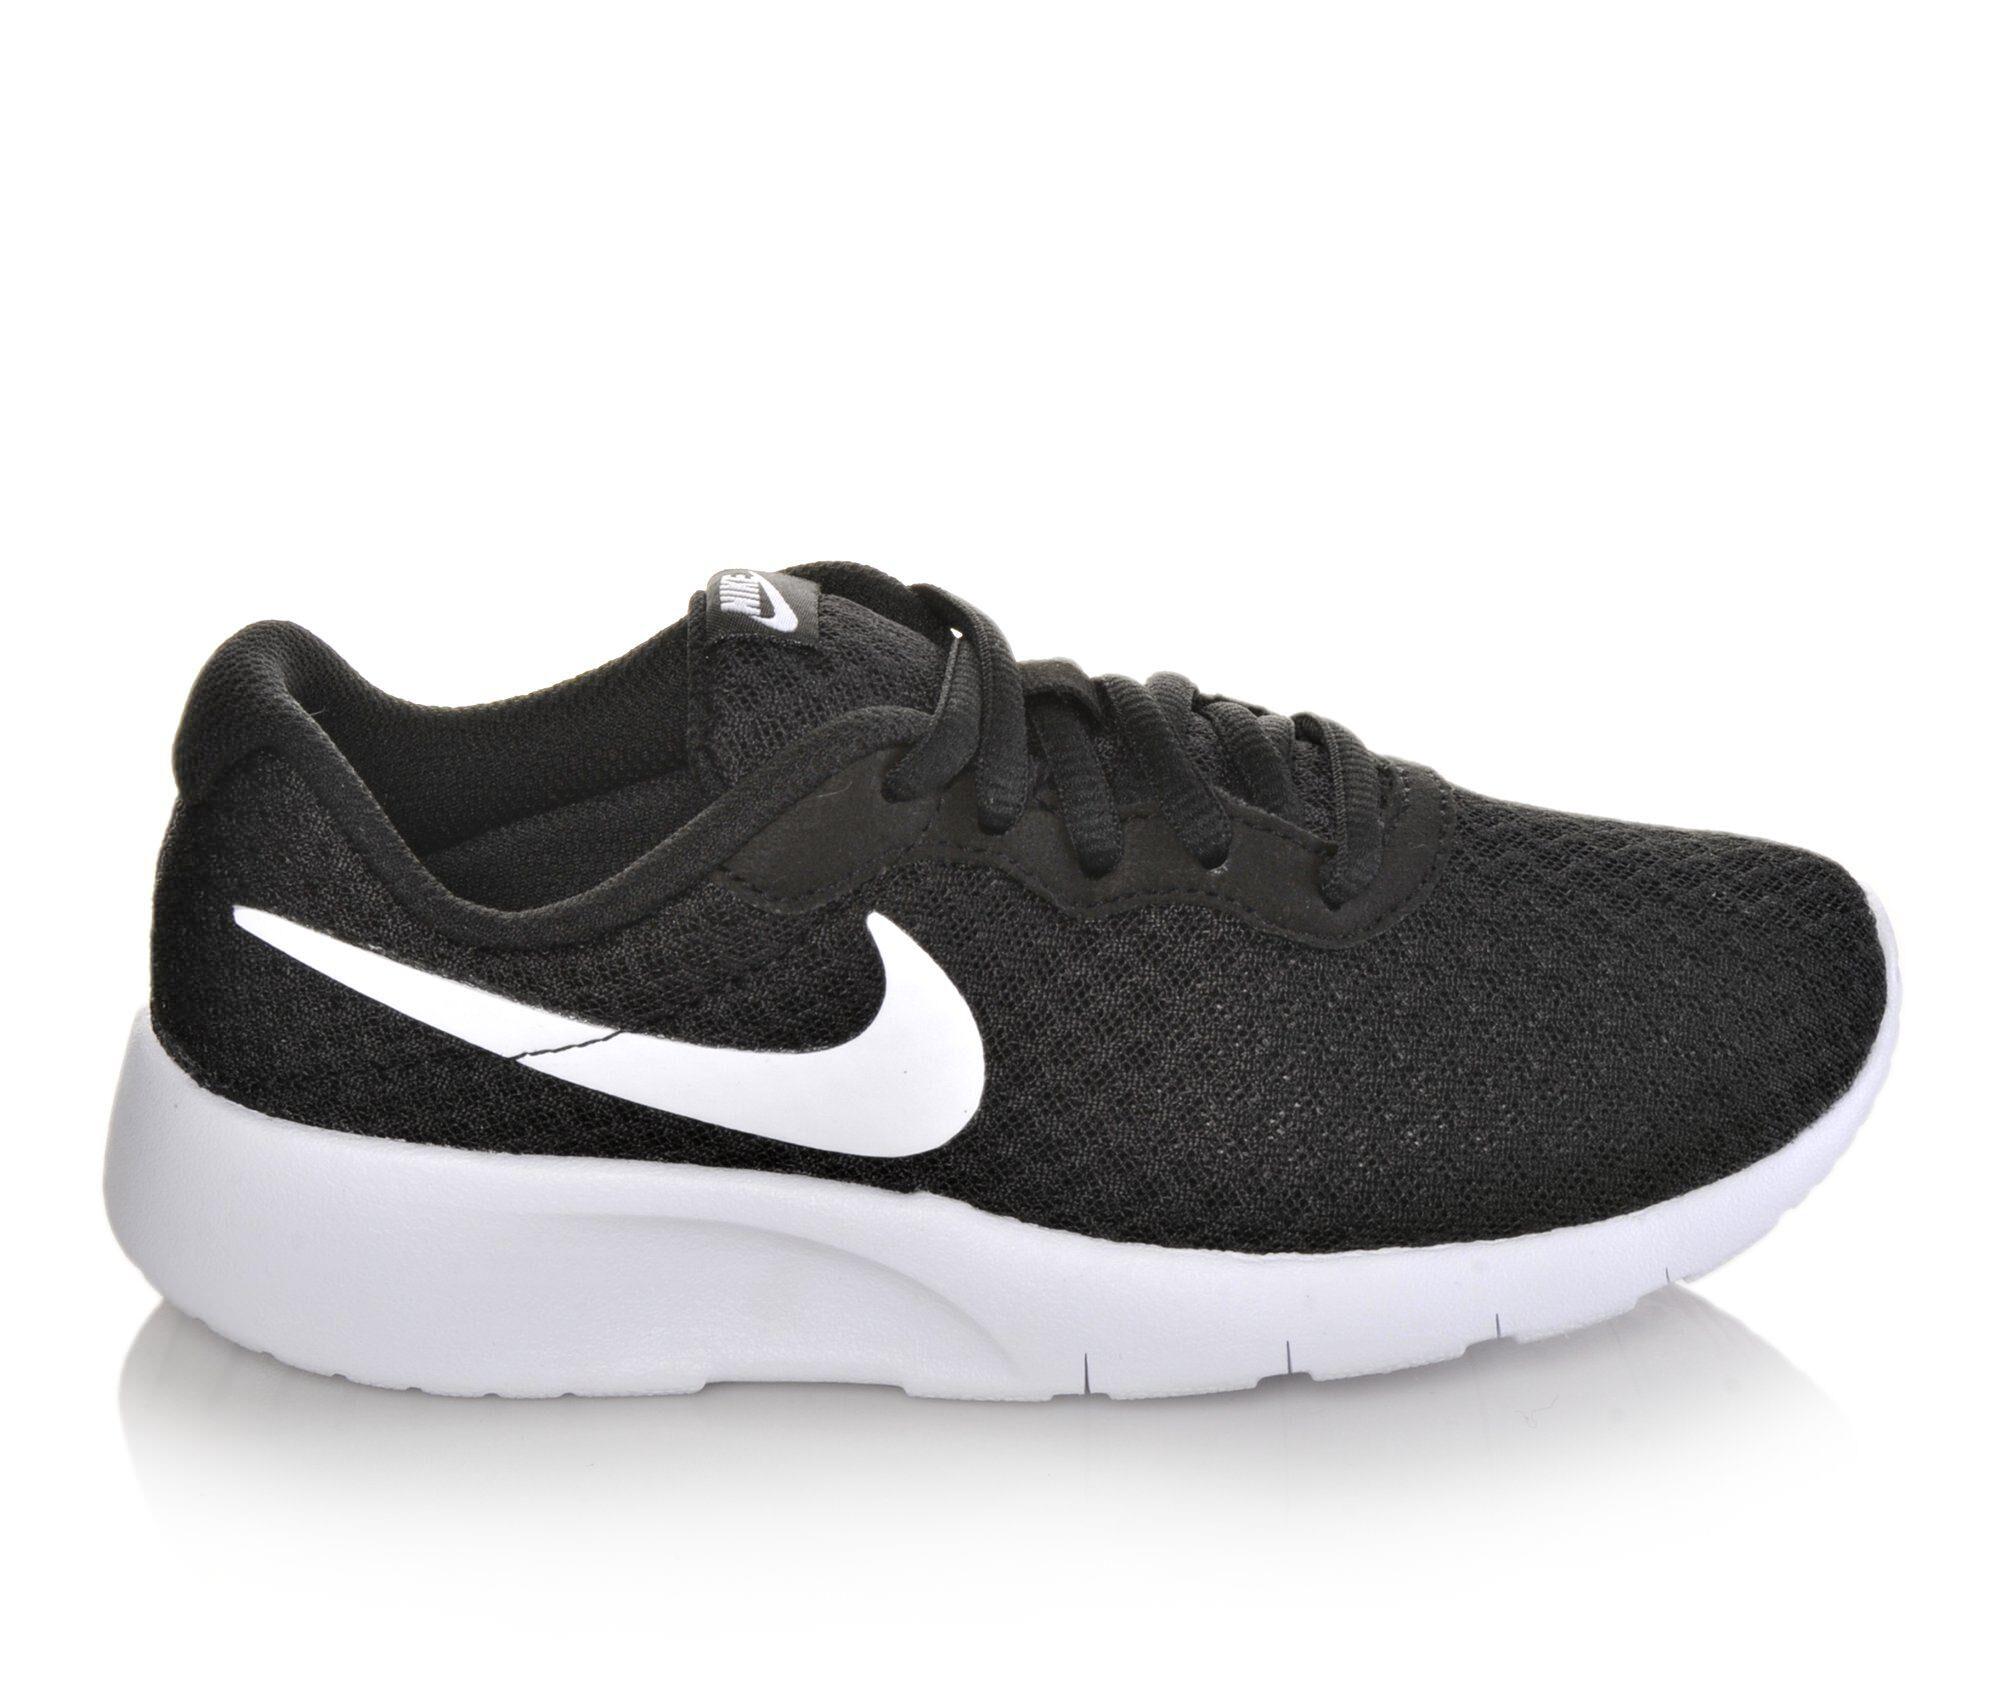 Kids' Nike Little Kid Tanjun Sneakers